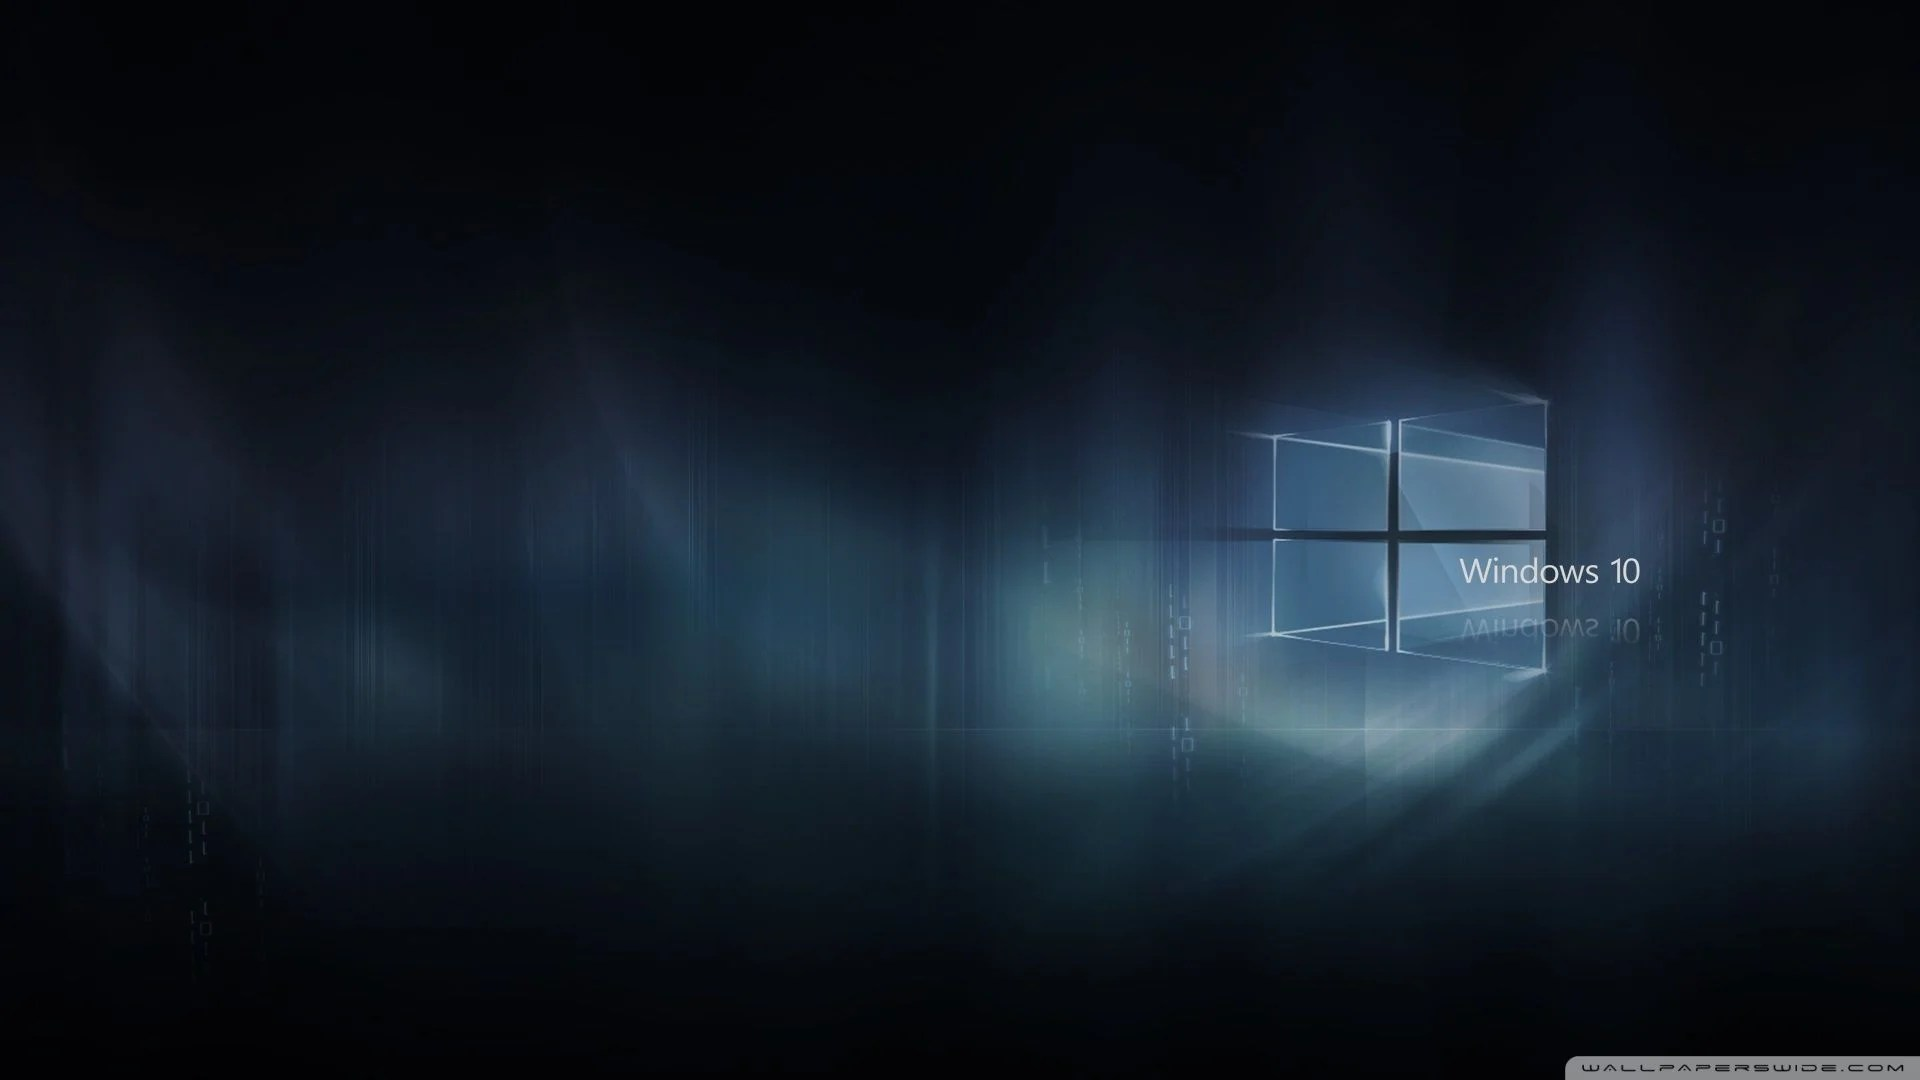 Windows 10 Hd Wallpapers Top Free Windows 10 Hd Backgrounds Wallpaperaccess